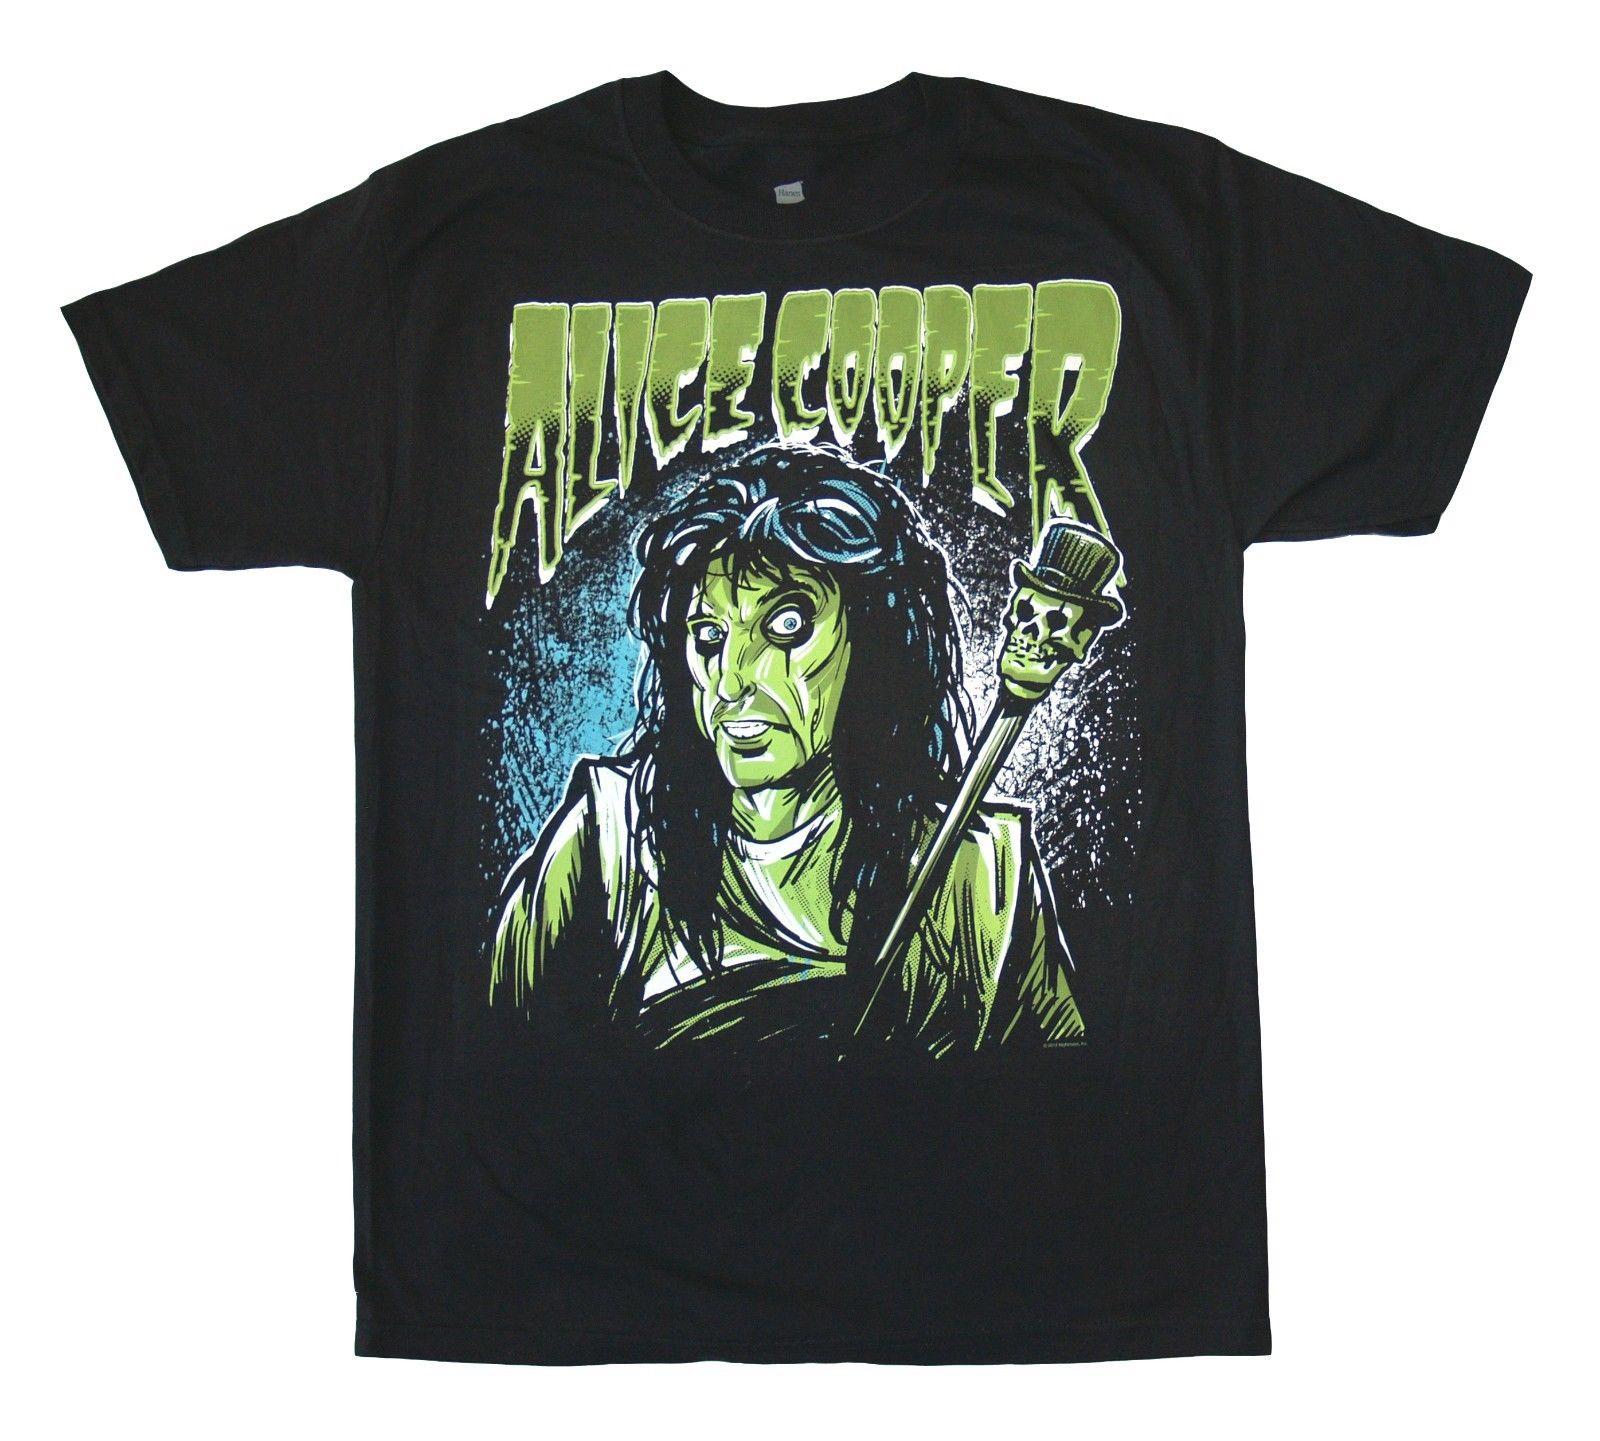 ALICE COOPER - Cooper Green - T SHIRT Medium Brand New Official T Shirt  Fresh Design 0c4f49126514